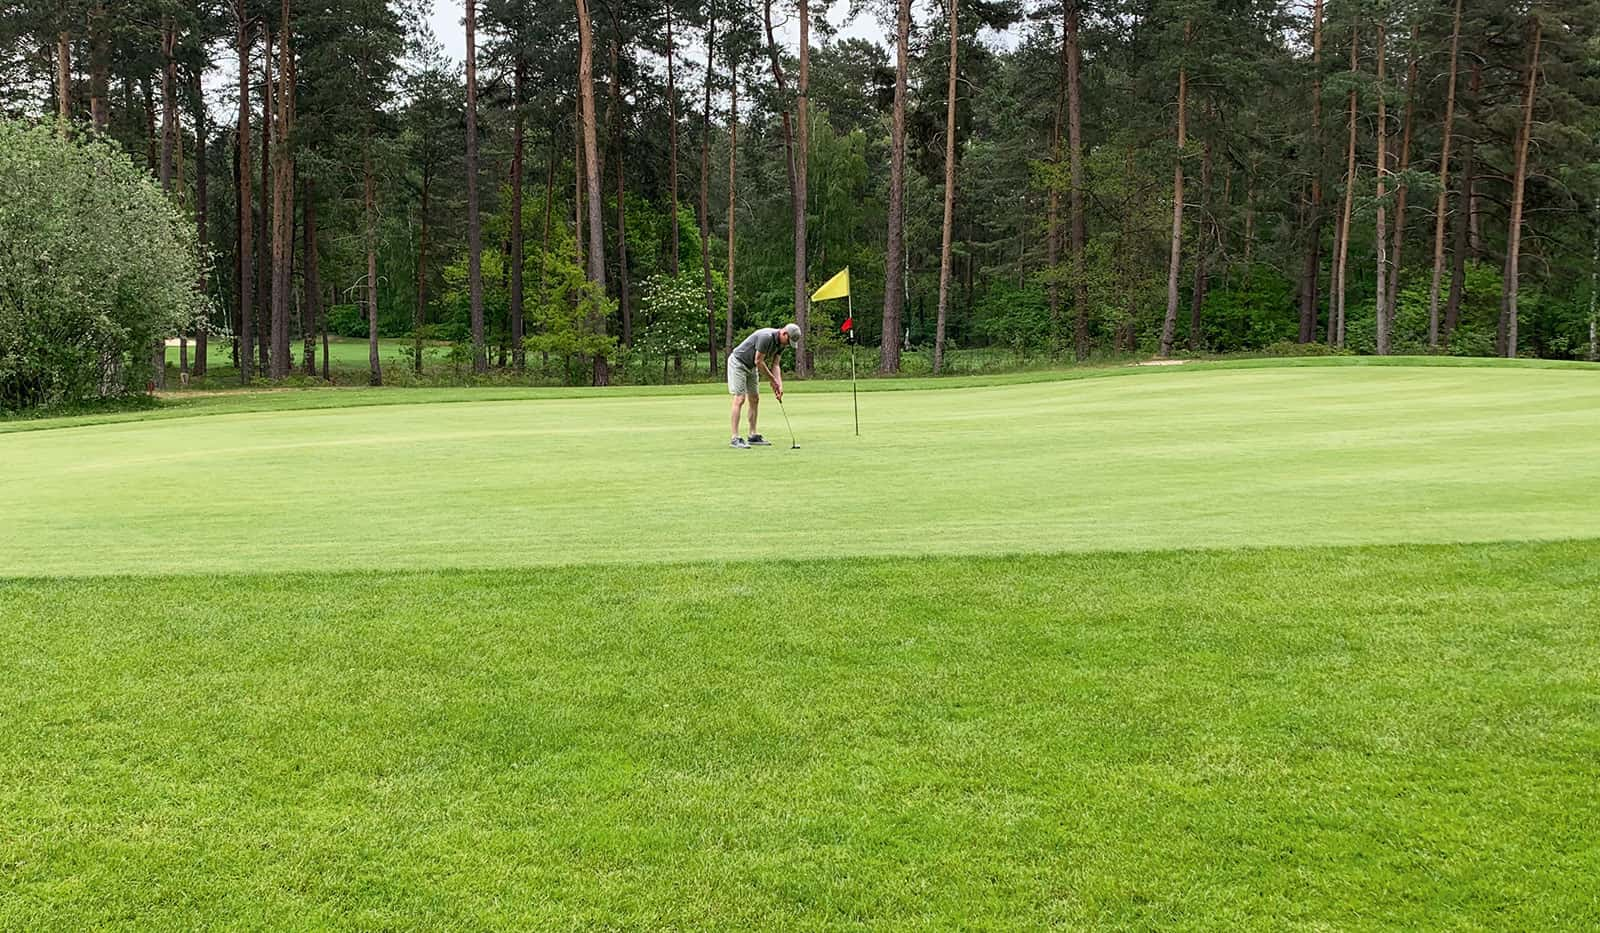 Hinnerk Baumgarten auf dem Golfplatz